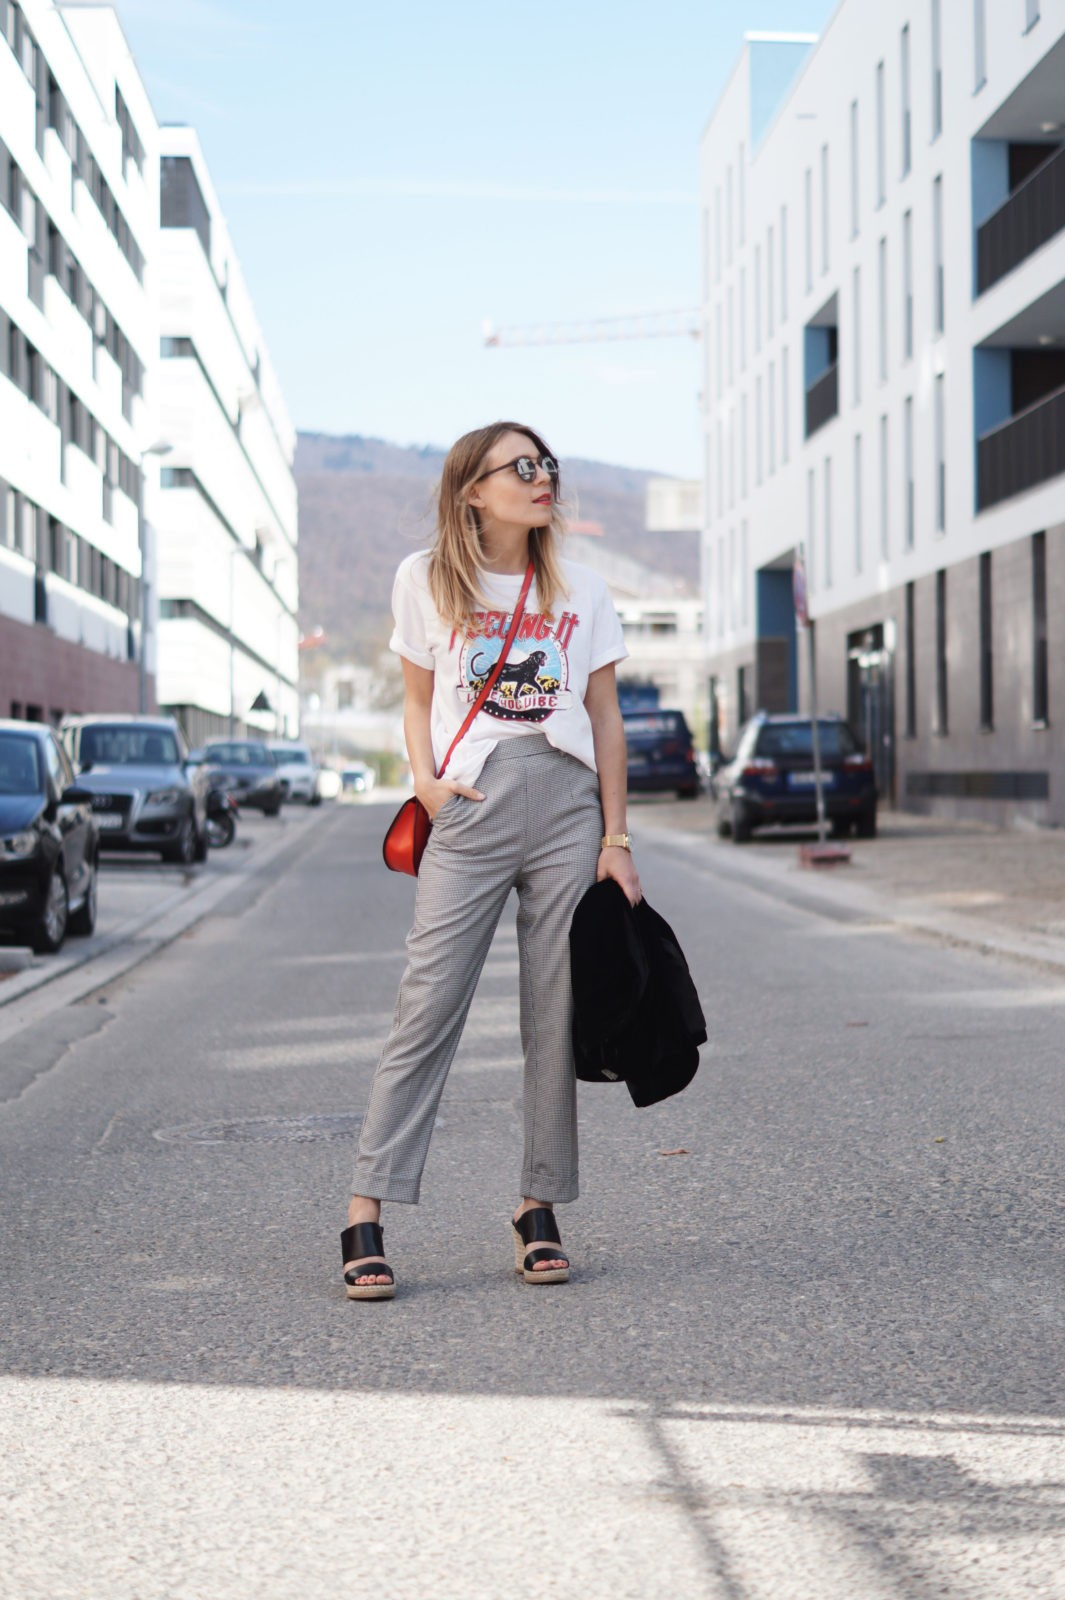 Slogan Shirt Pop of Red Outfit Fashionblogger Sariety Modeblog Heidelberg Bandshirt Karohose rote Tasche Slacks Streetstyle